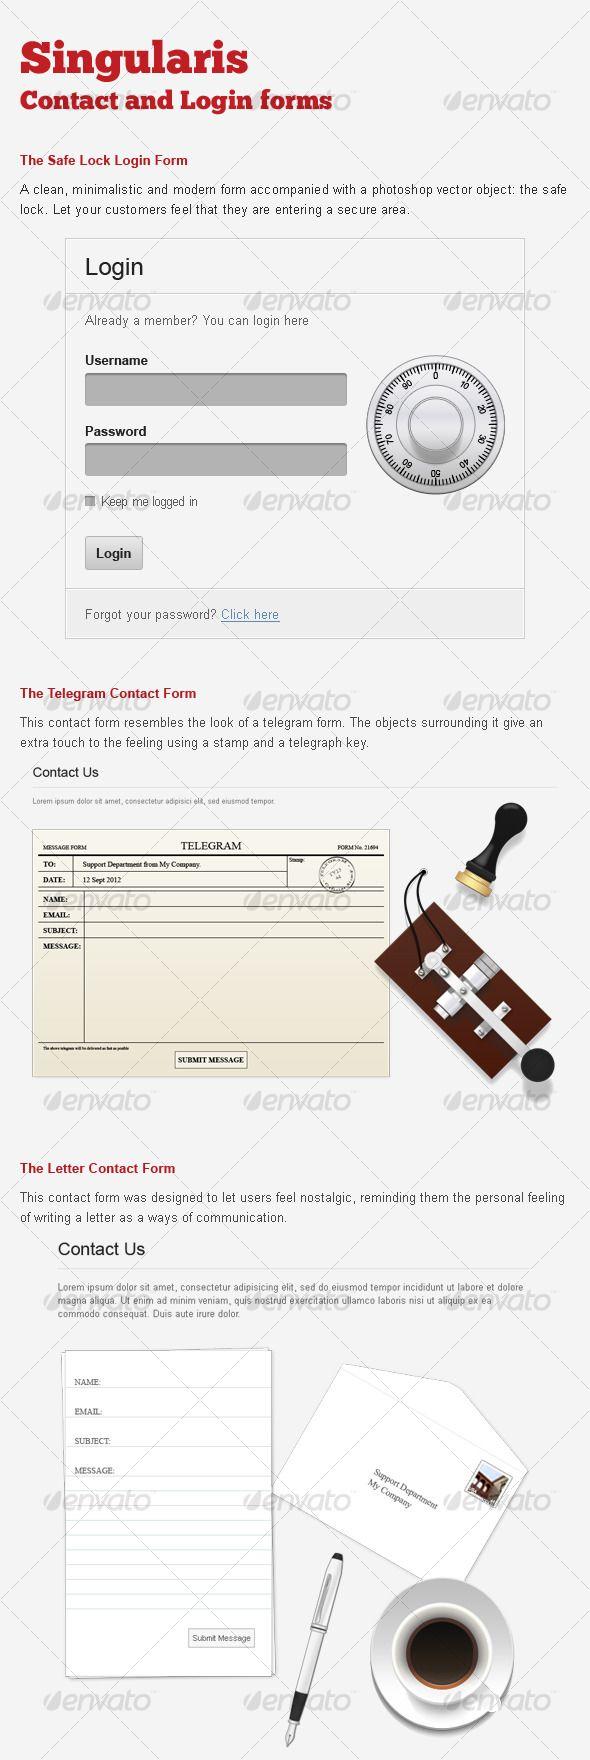 Cool log-in form with safe lock image | Digital Marketing